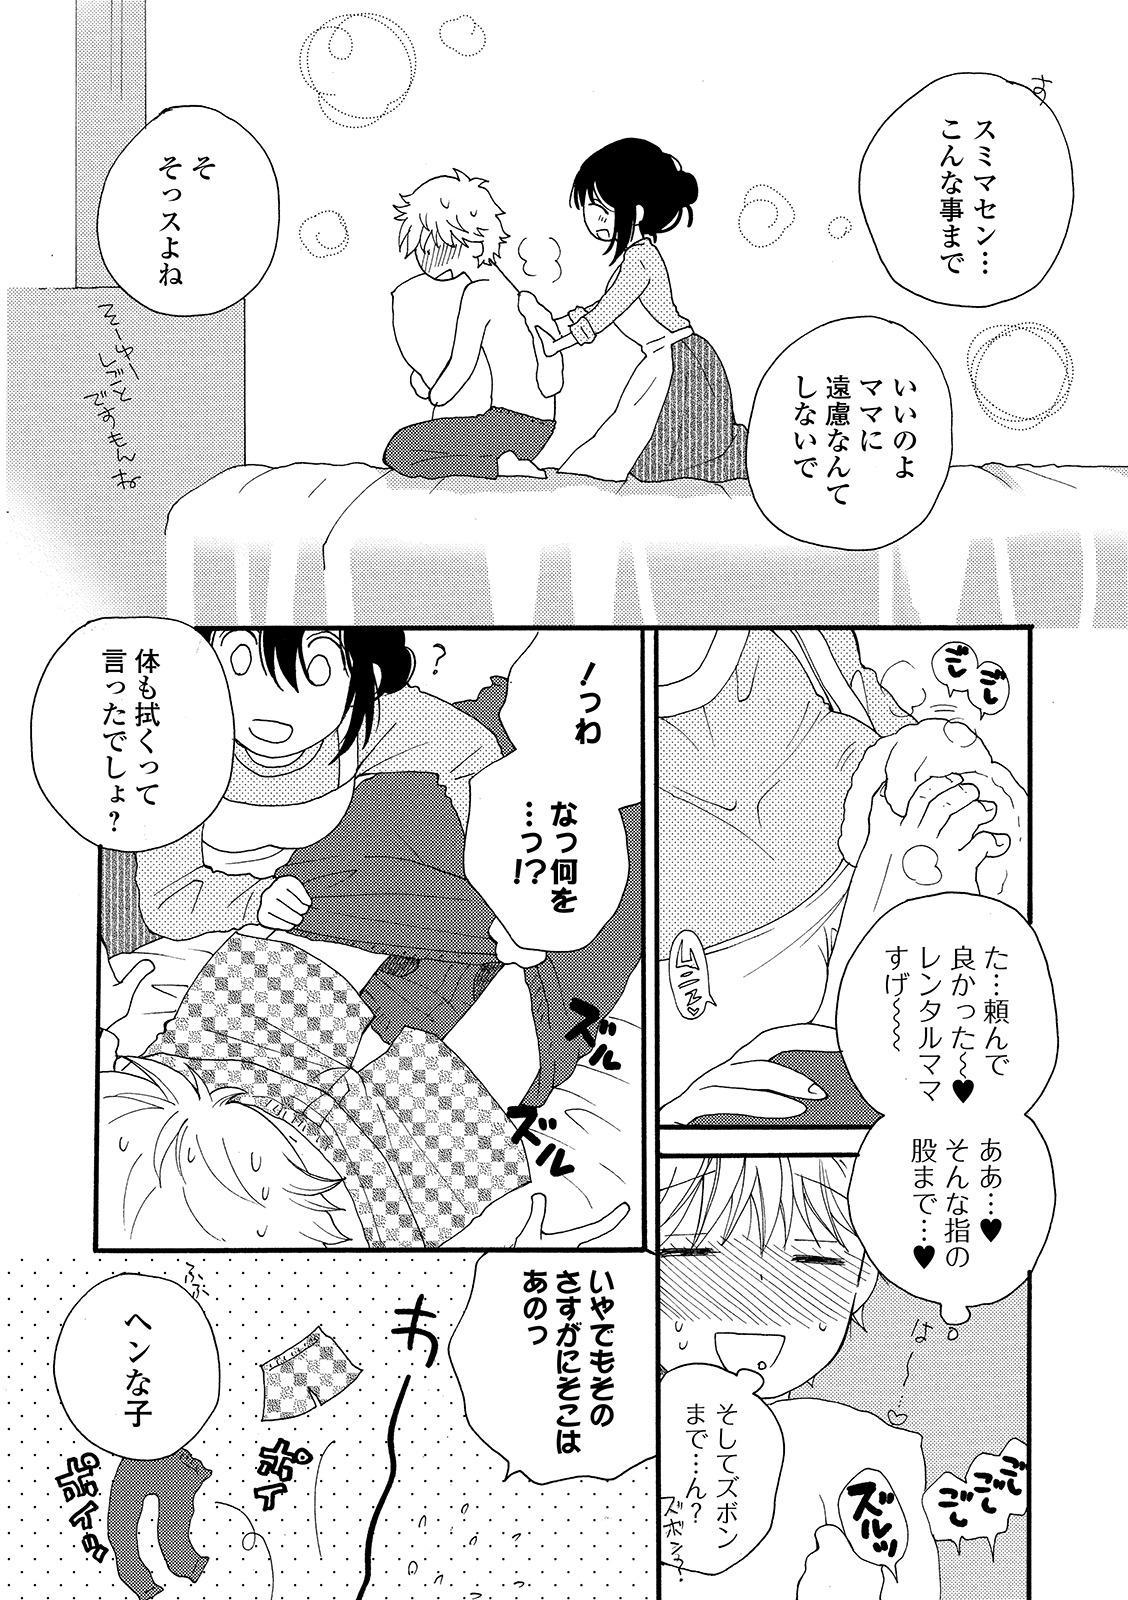 COMIC Shigekiteki SQUIRT!! Vol. 15 74